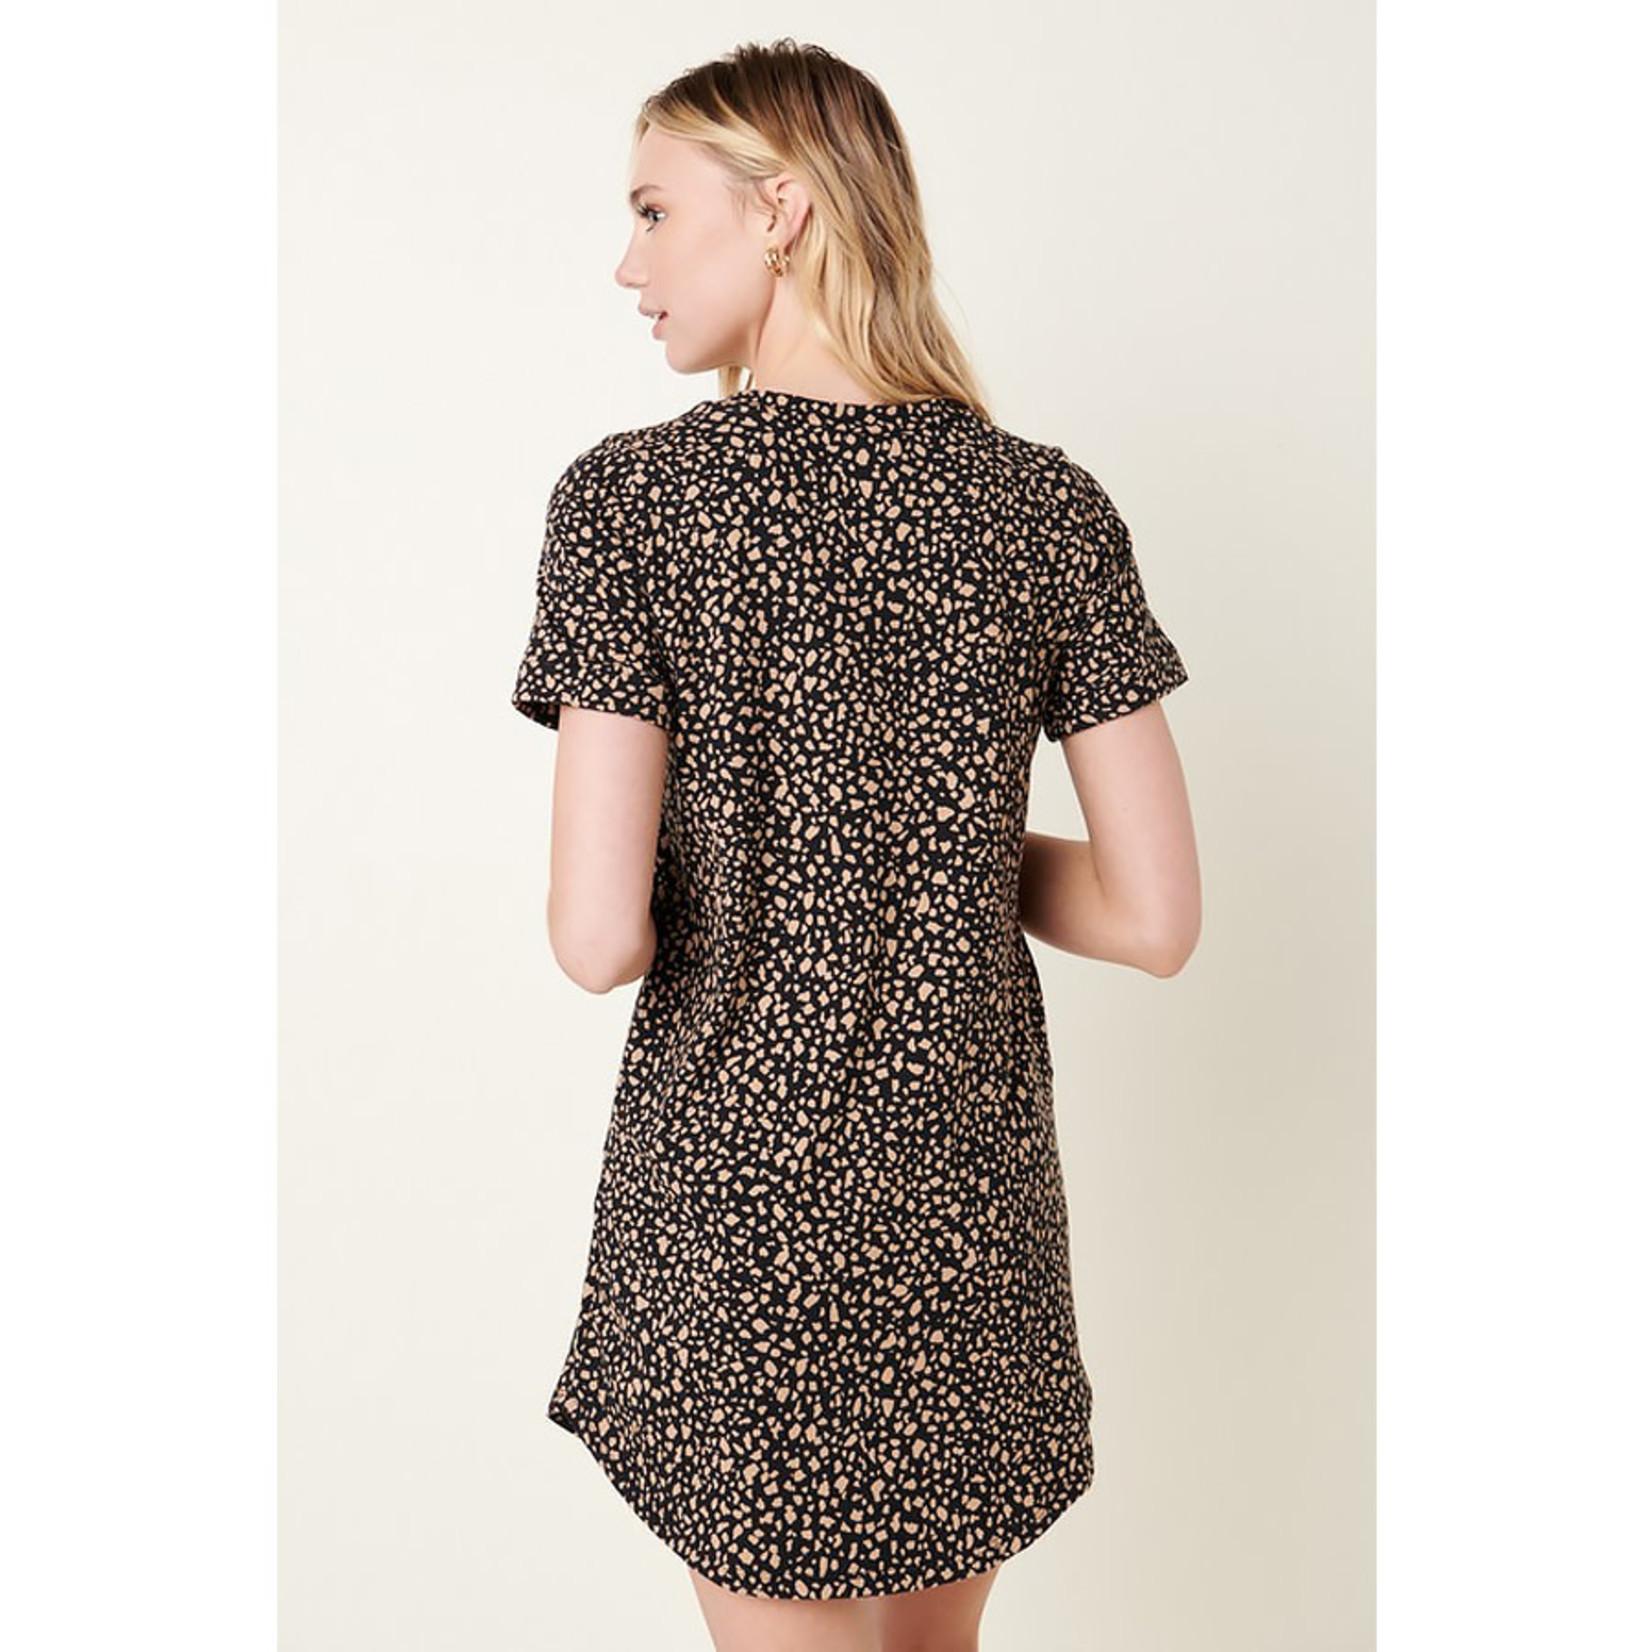 Mittoshop Animal Print Tee Dress